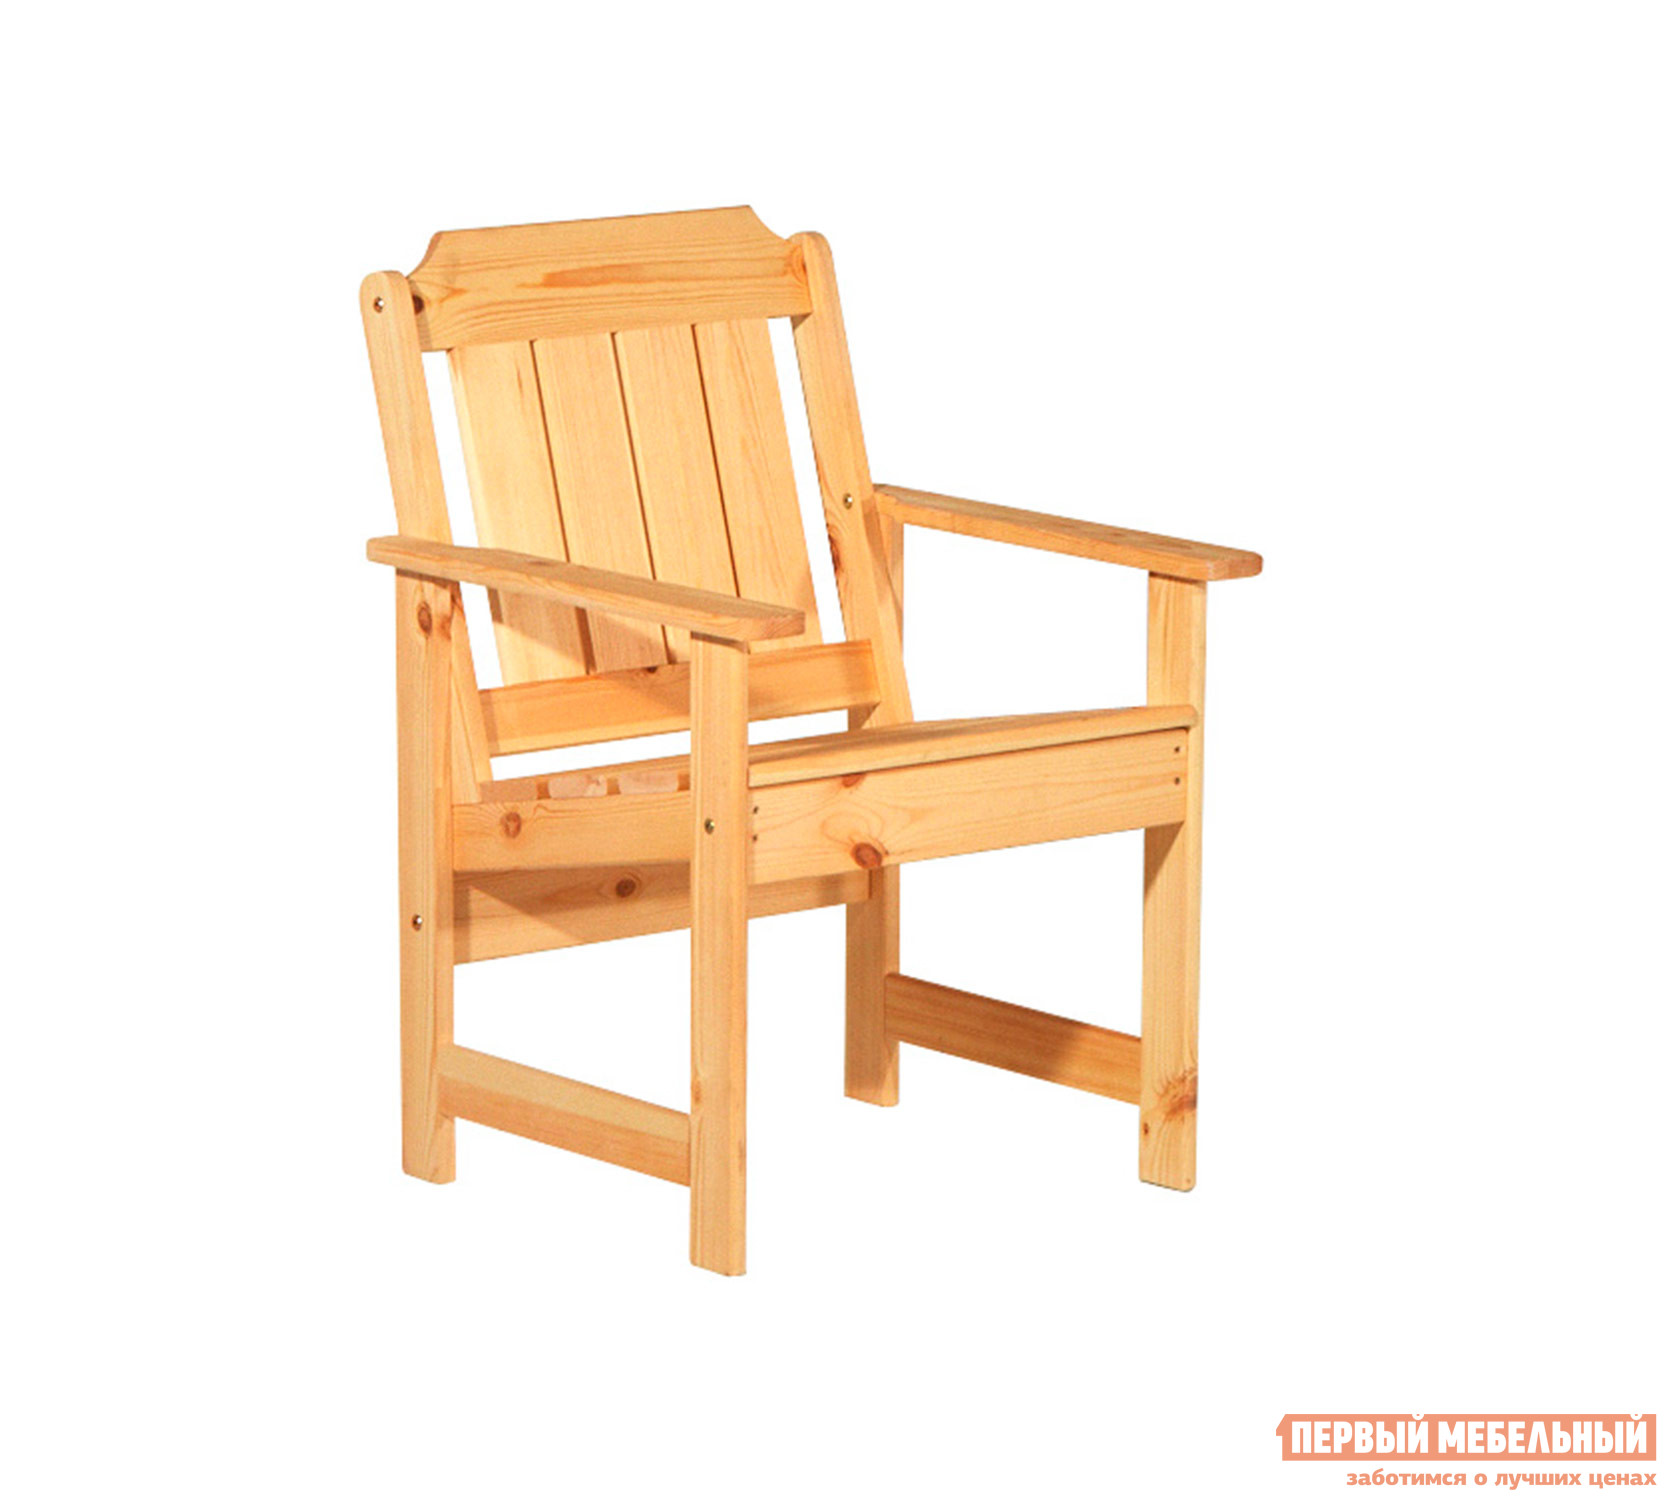 Дачное кресло Timberica Кресло Ярви